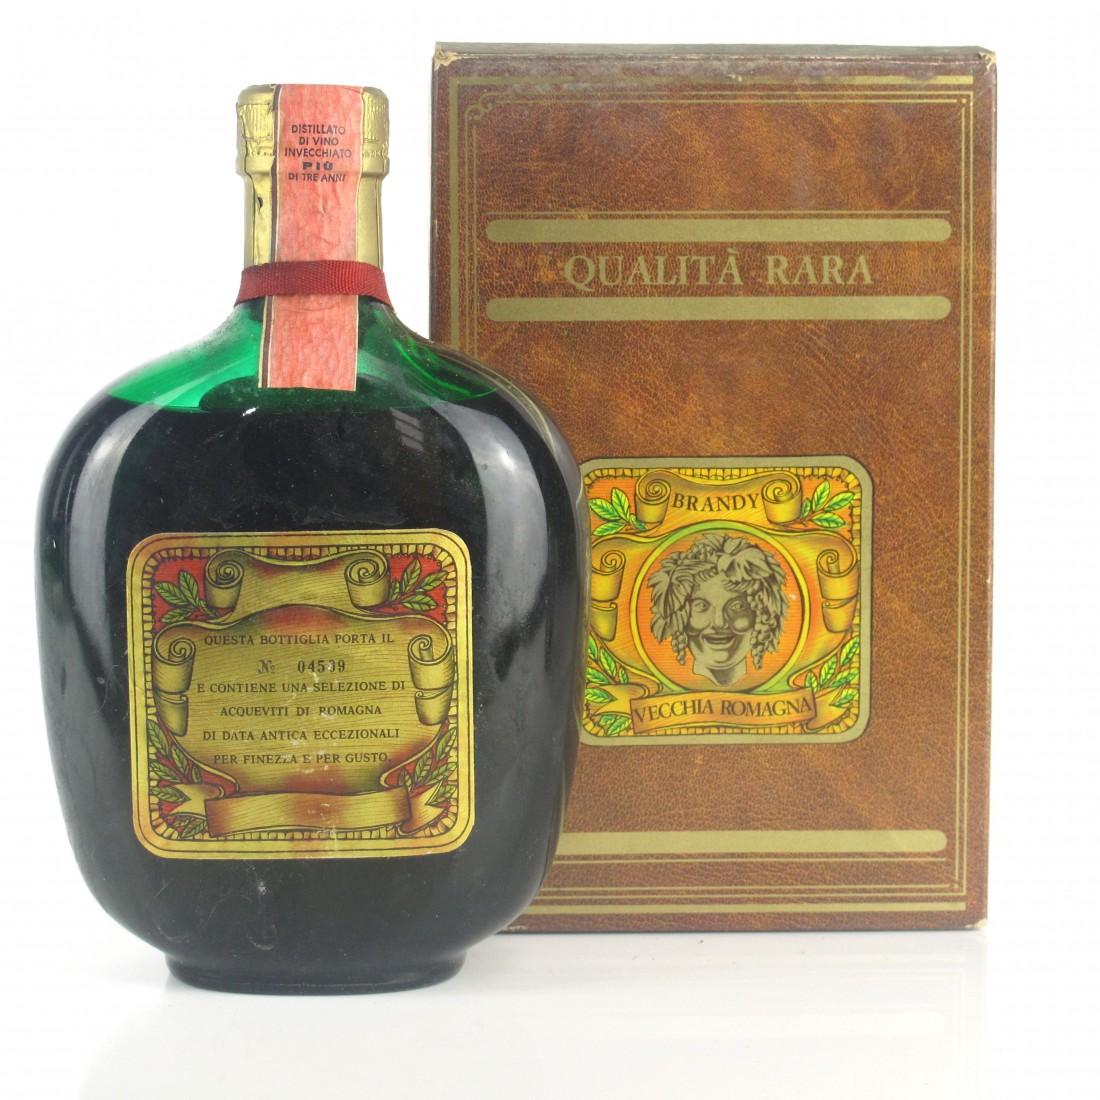 Buton Vecchia Romagna Brandy 1970s